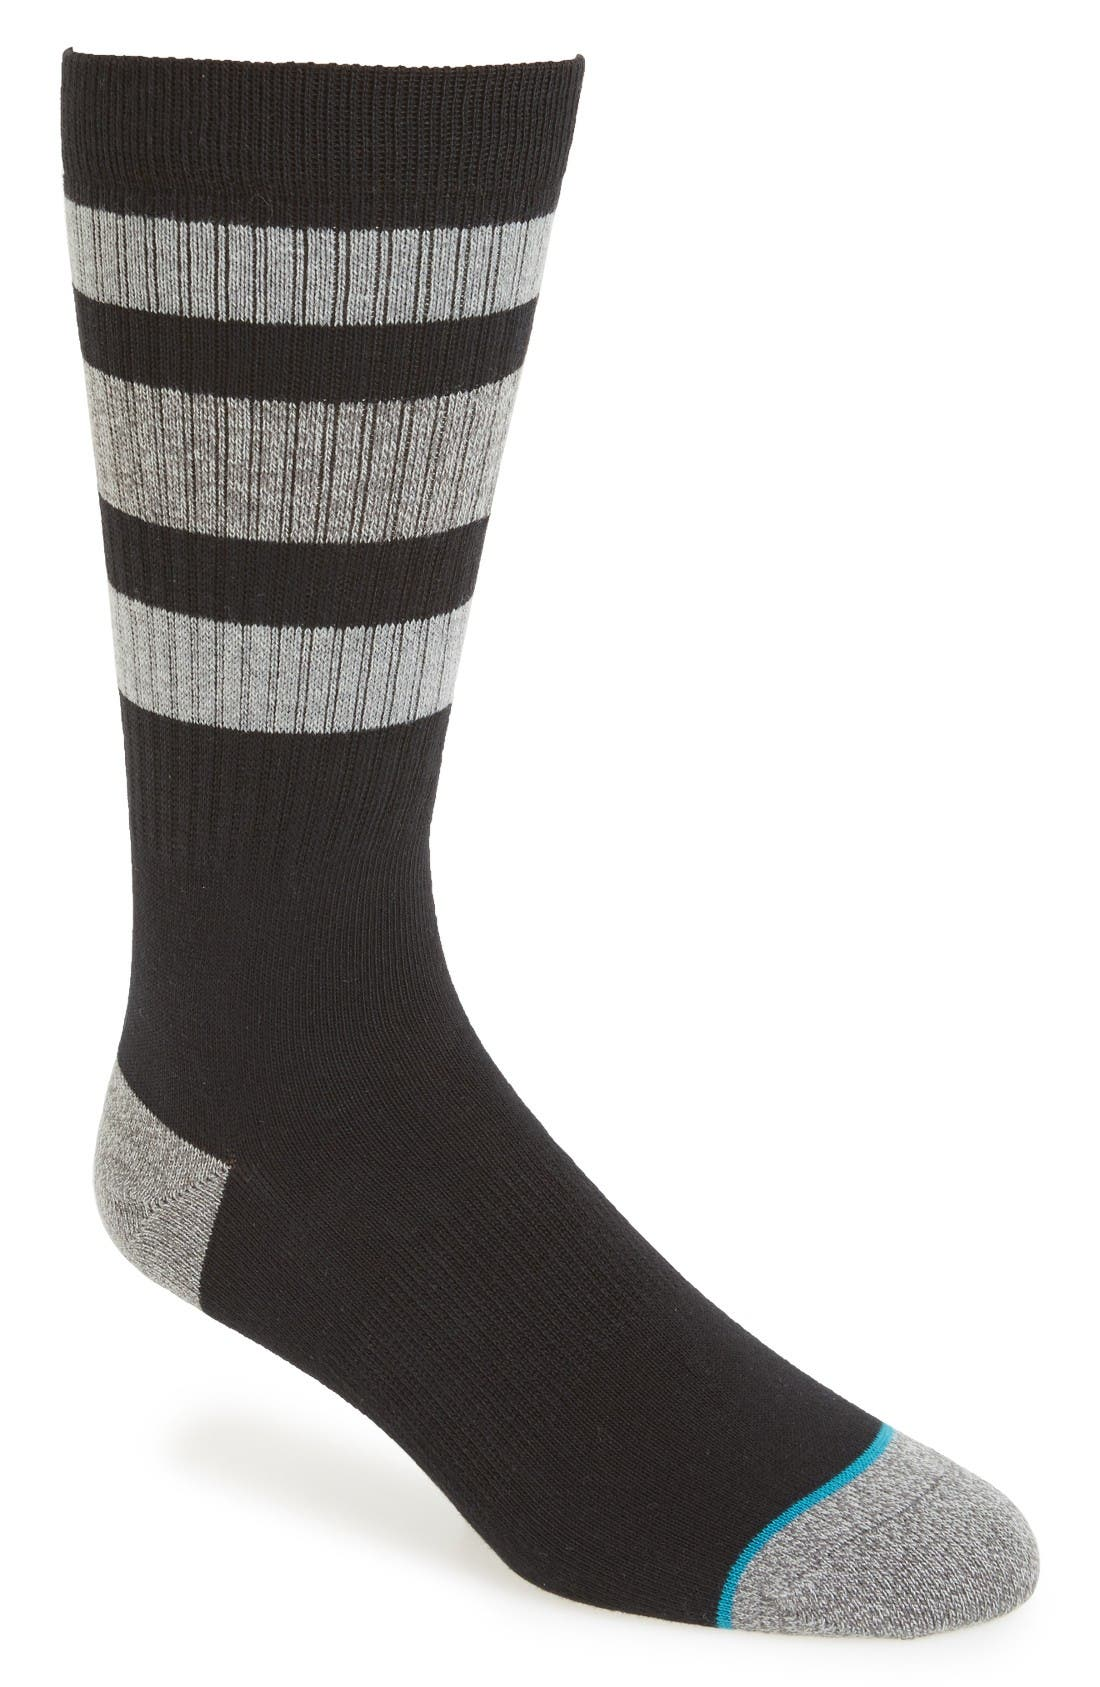 Main Image - Stance Stripe Crew Socks